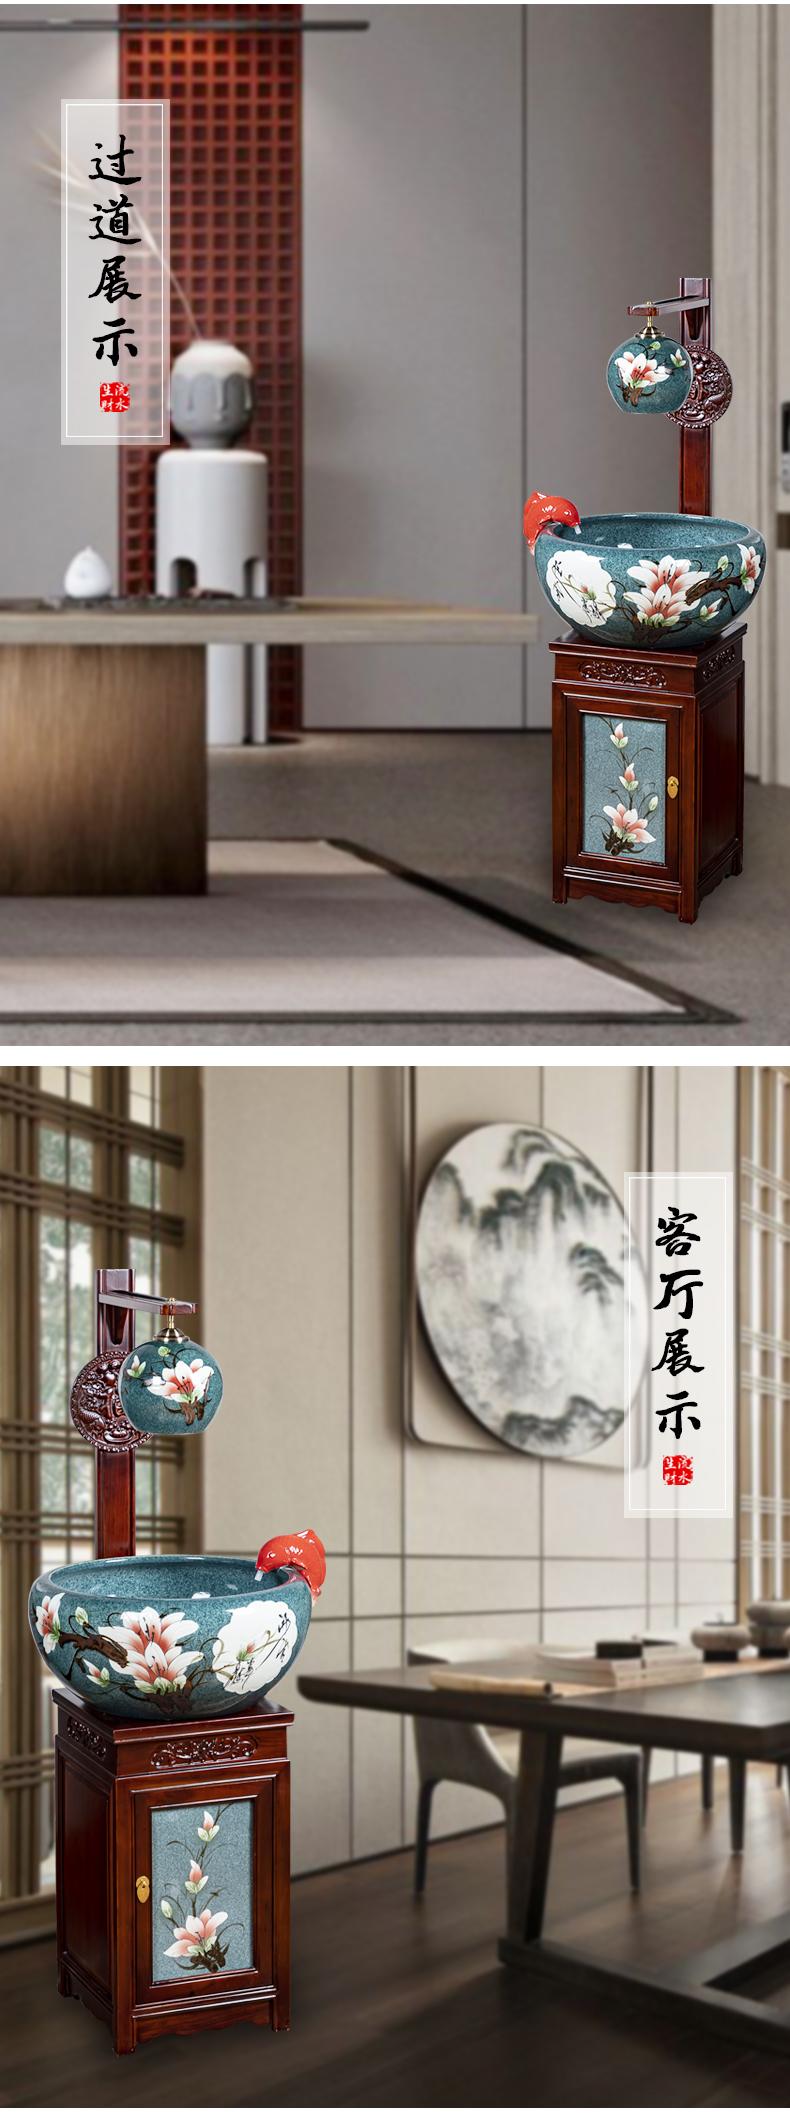 Jingdezhen ceramic cabinet demand goldfish tank be born feel sea cylinder porcelain jar home sitting room porch fish bowl